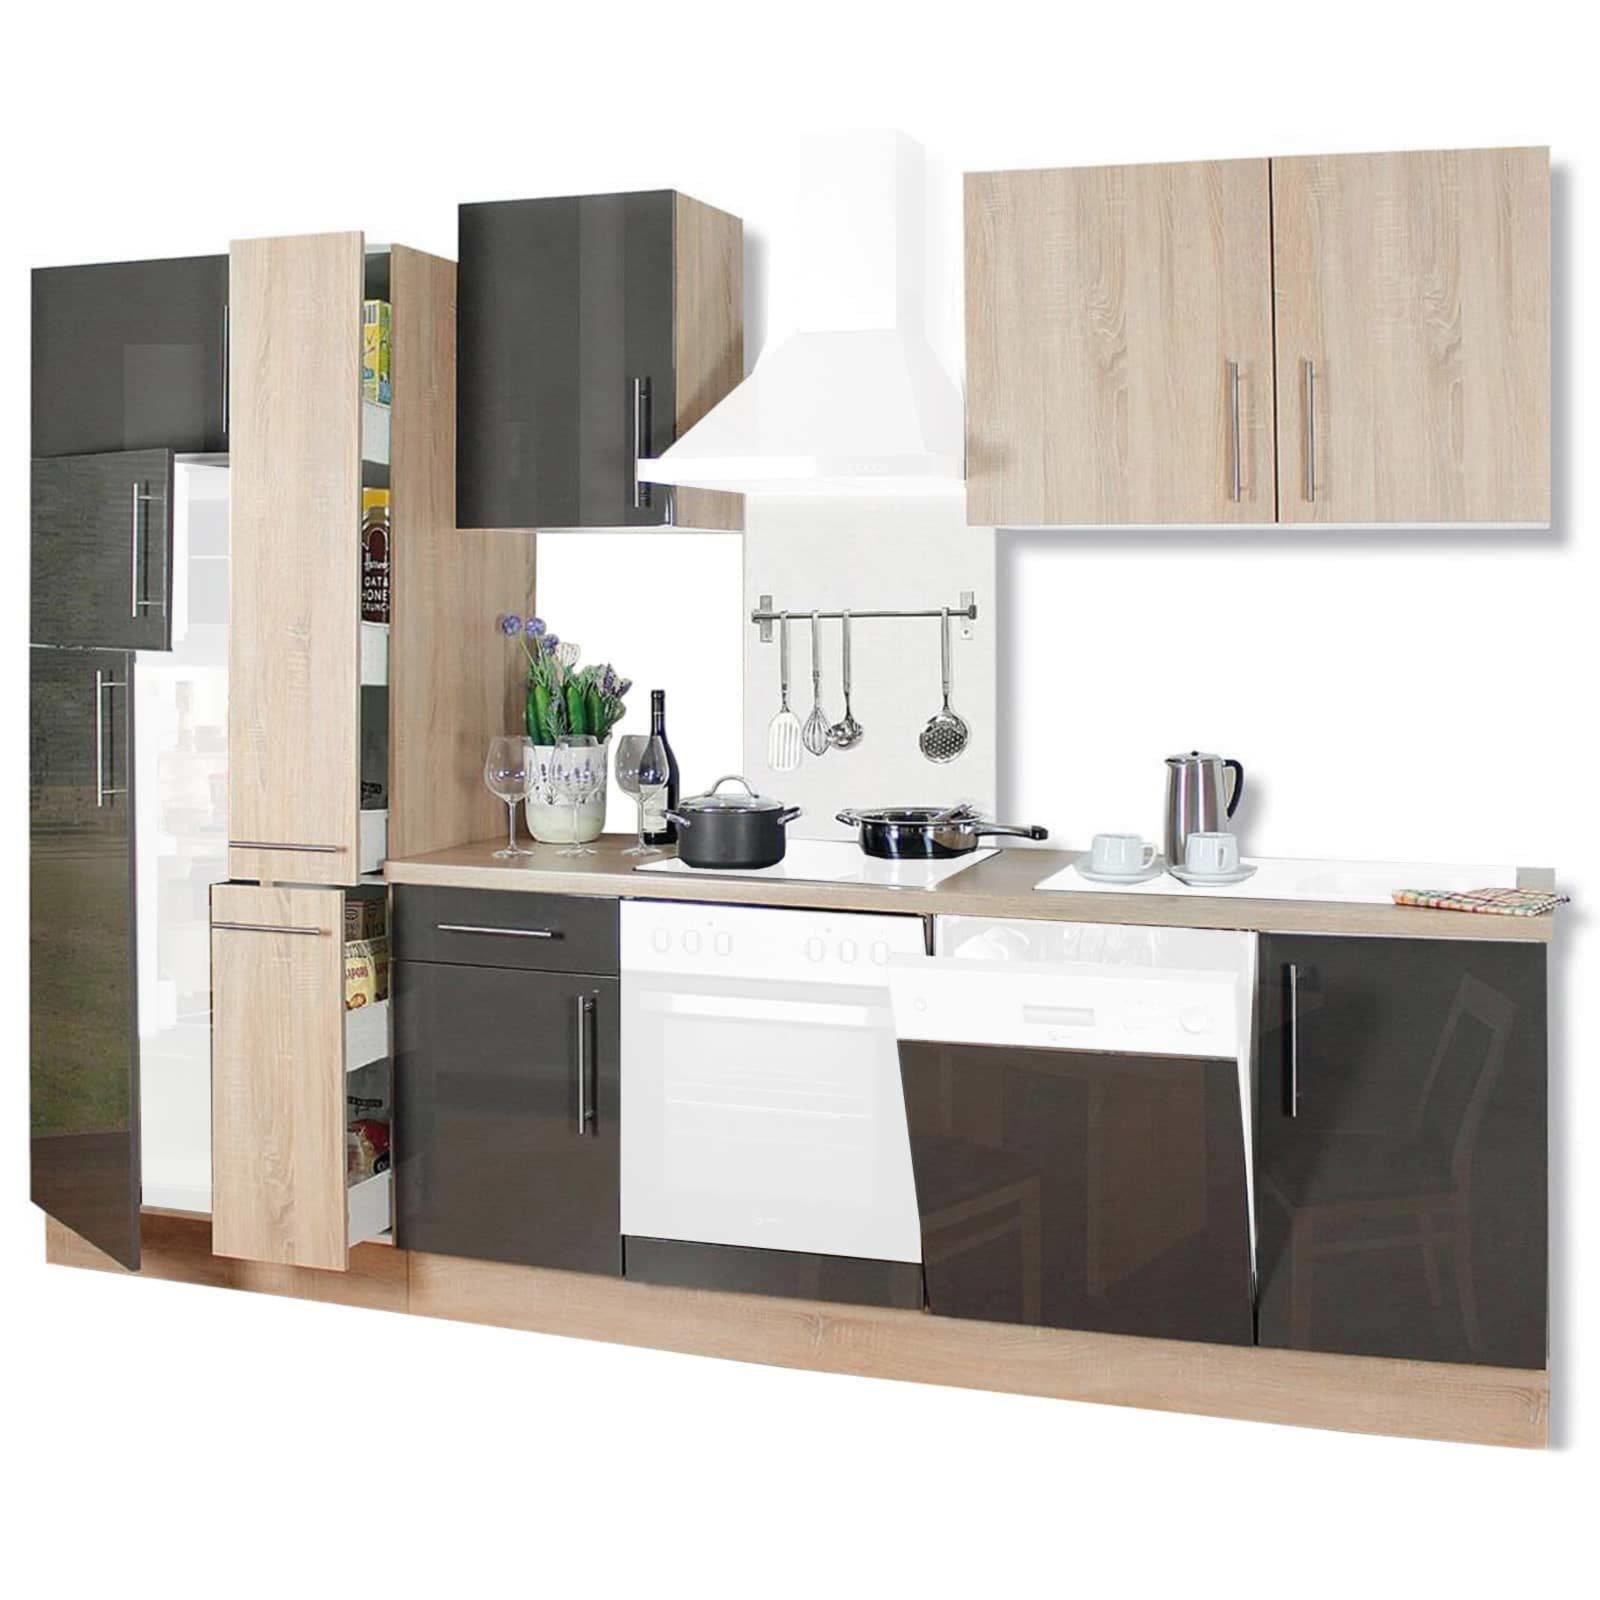 Küchenblock JANA - Sonoma Eiche-Lava Hochglanz - 310 cm ...